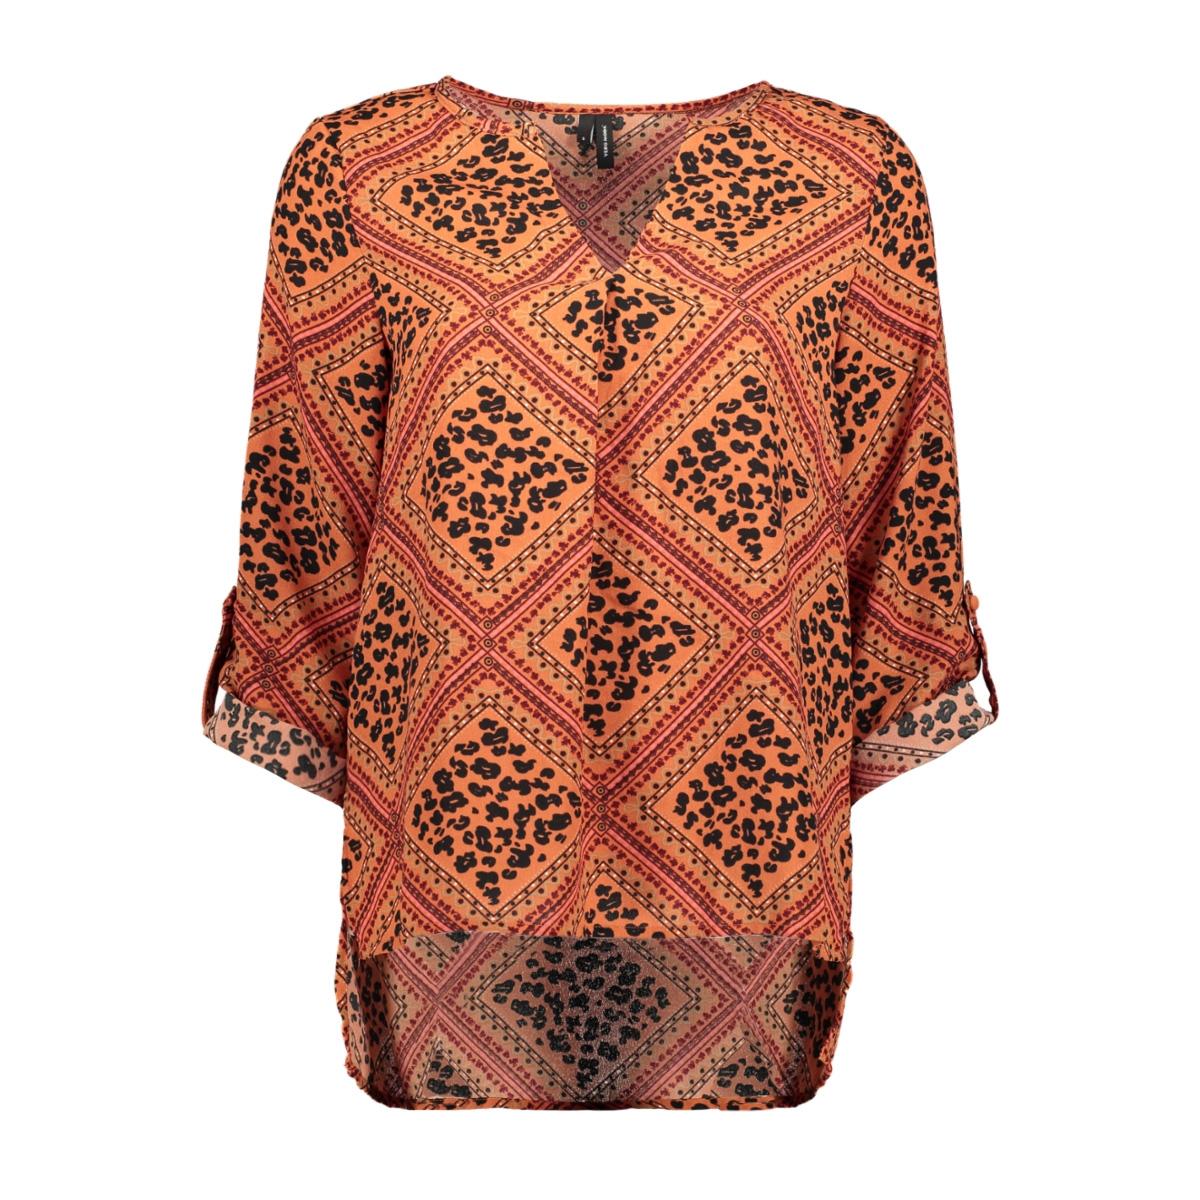 vmnaya 7/8 v-neck top exp 10228774 vero moda blouse bruschetta/graphic